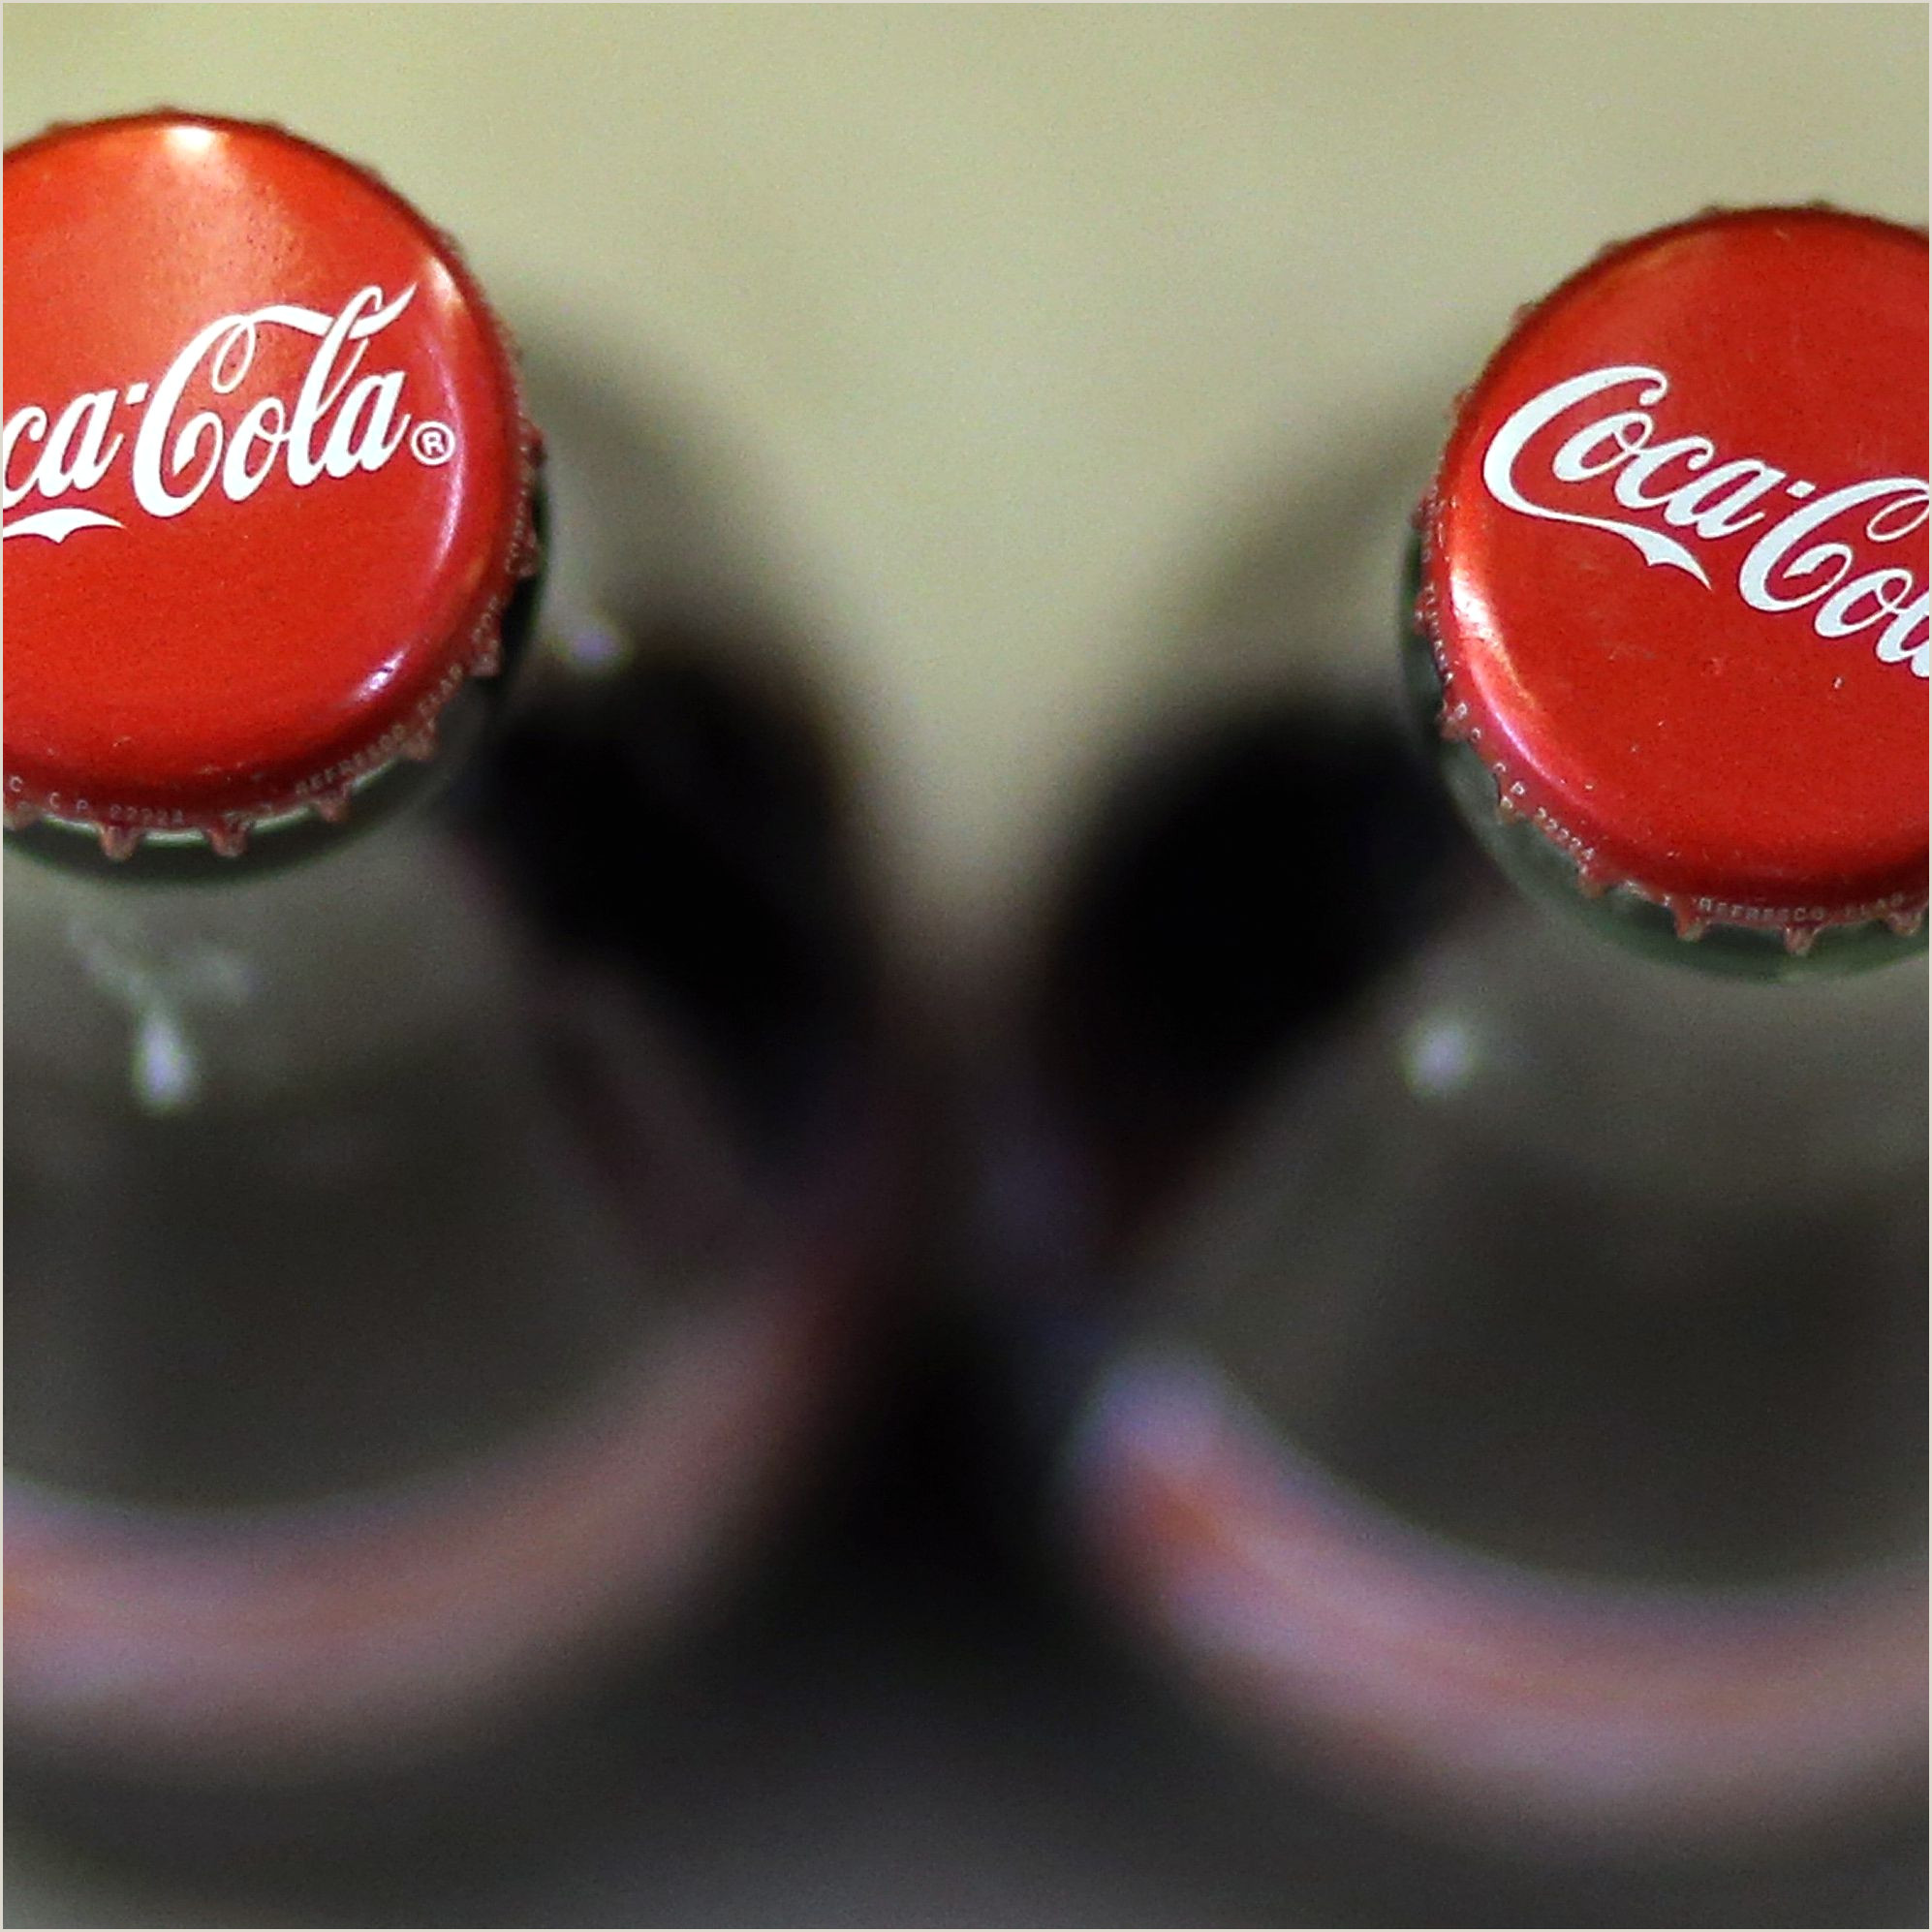 The History of Coca Cola and John Pemberton